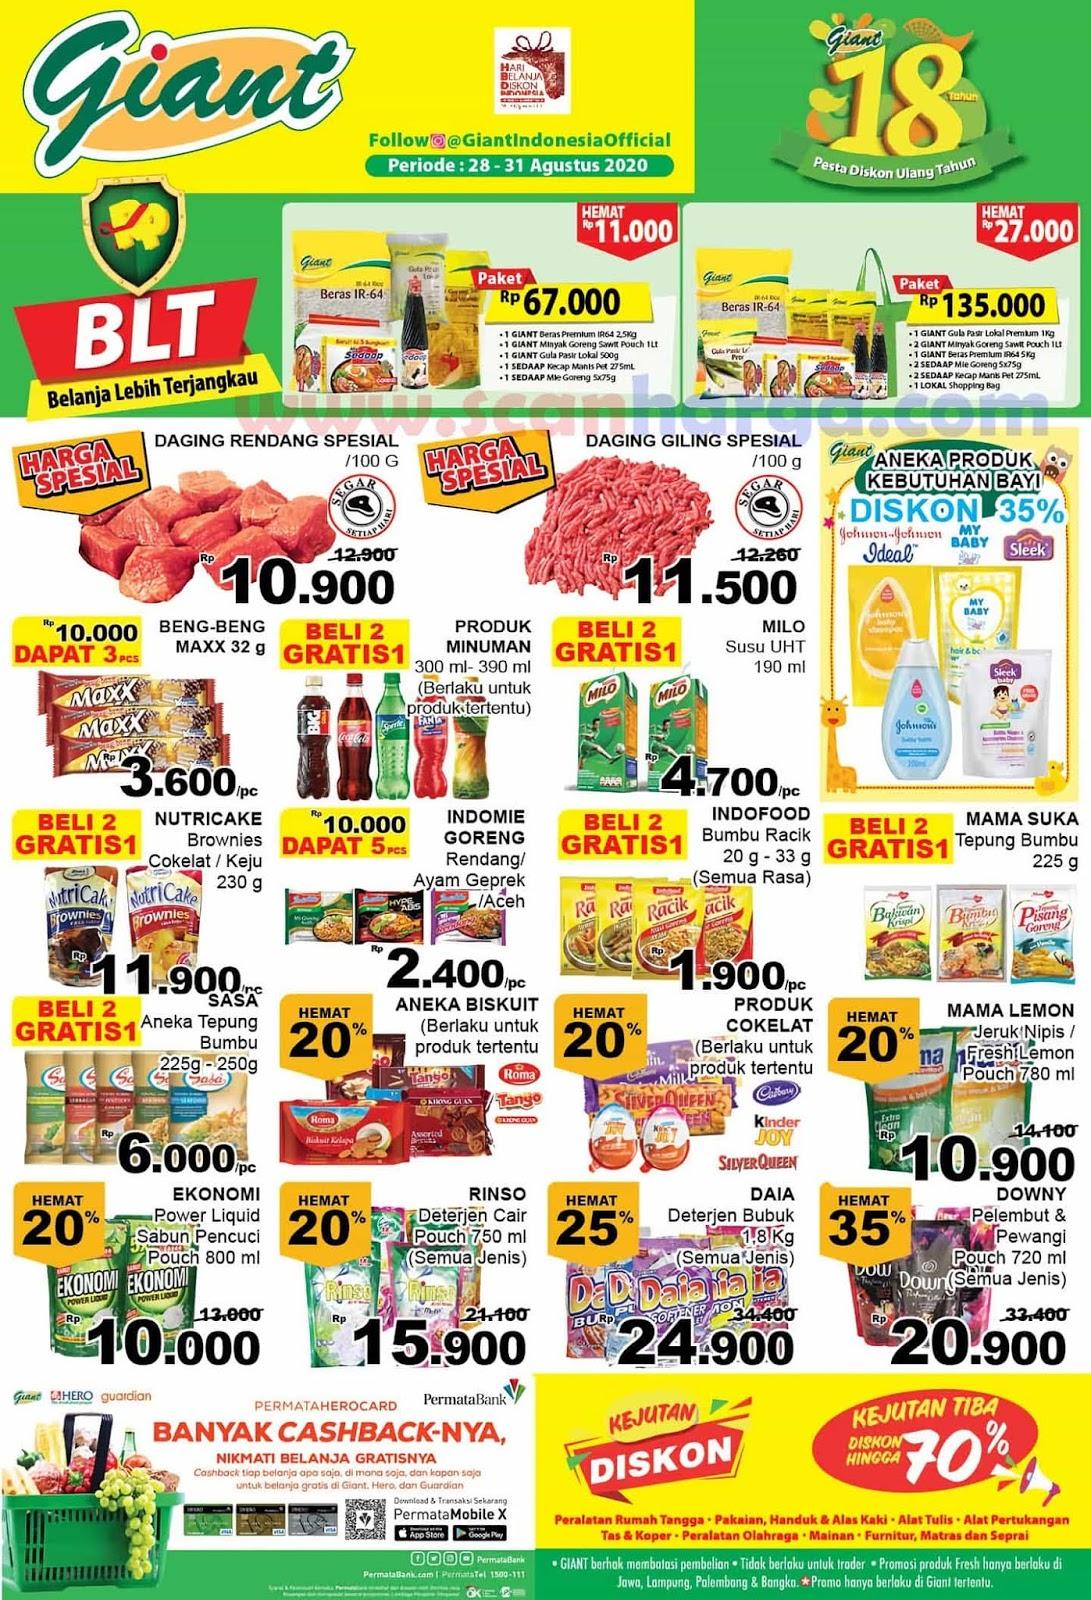 Katalog Promo BLT Giant - Belanja Lebih Terjangkau Periode 28 - 31 Agustus 2020